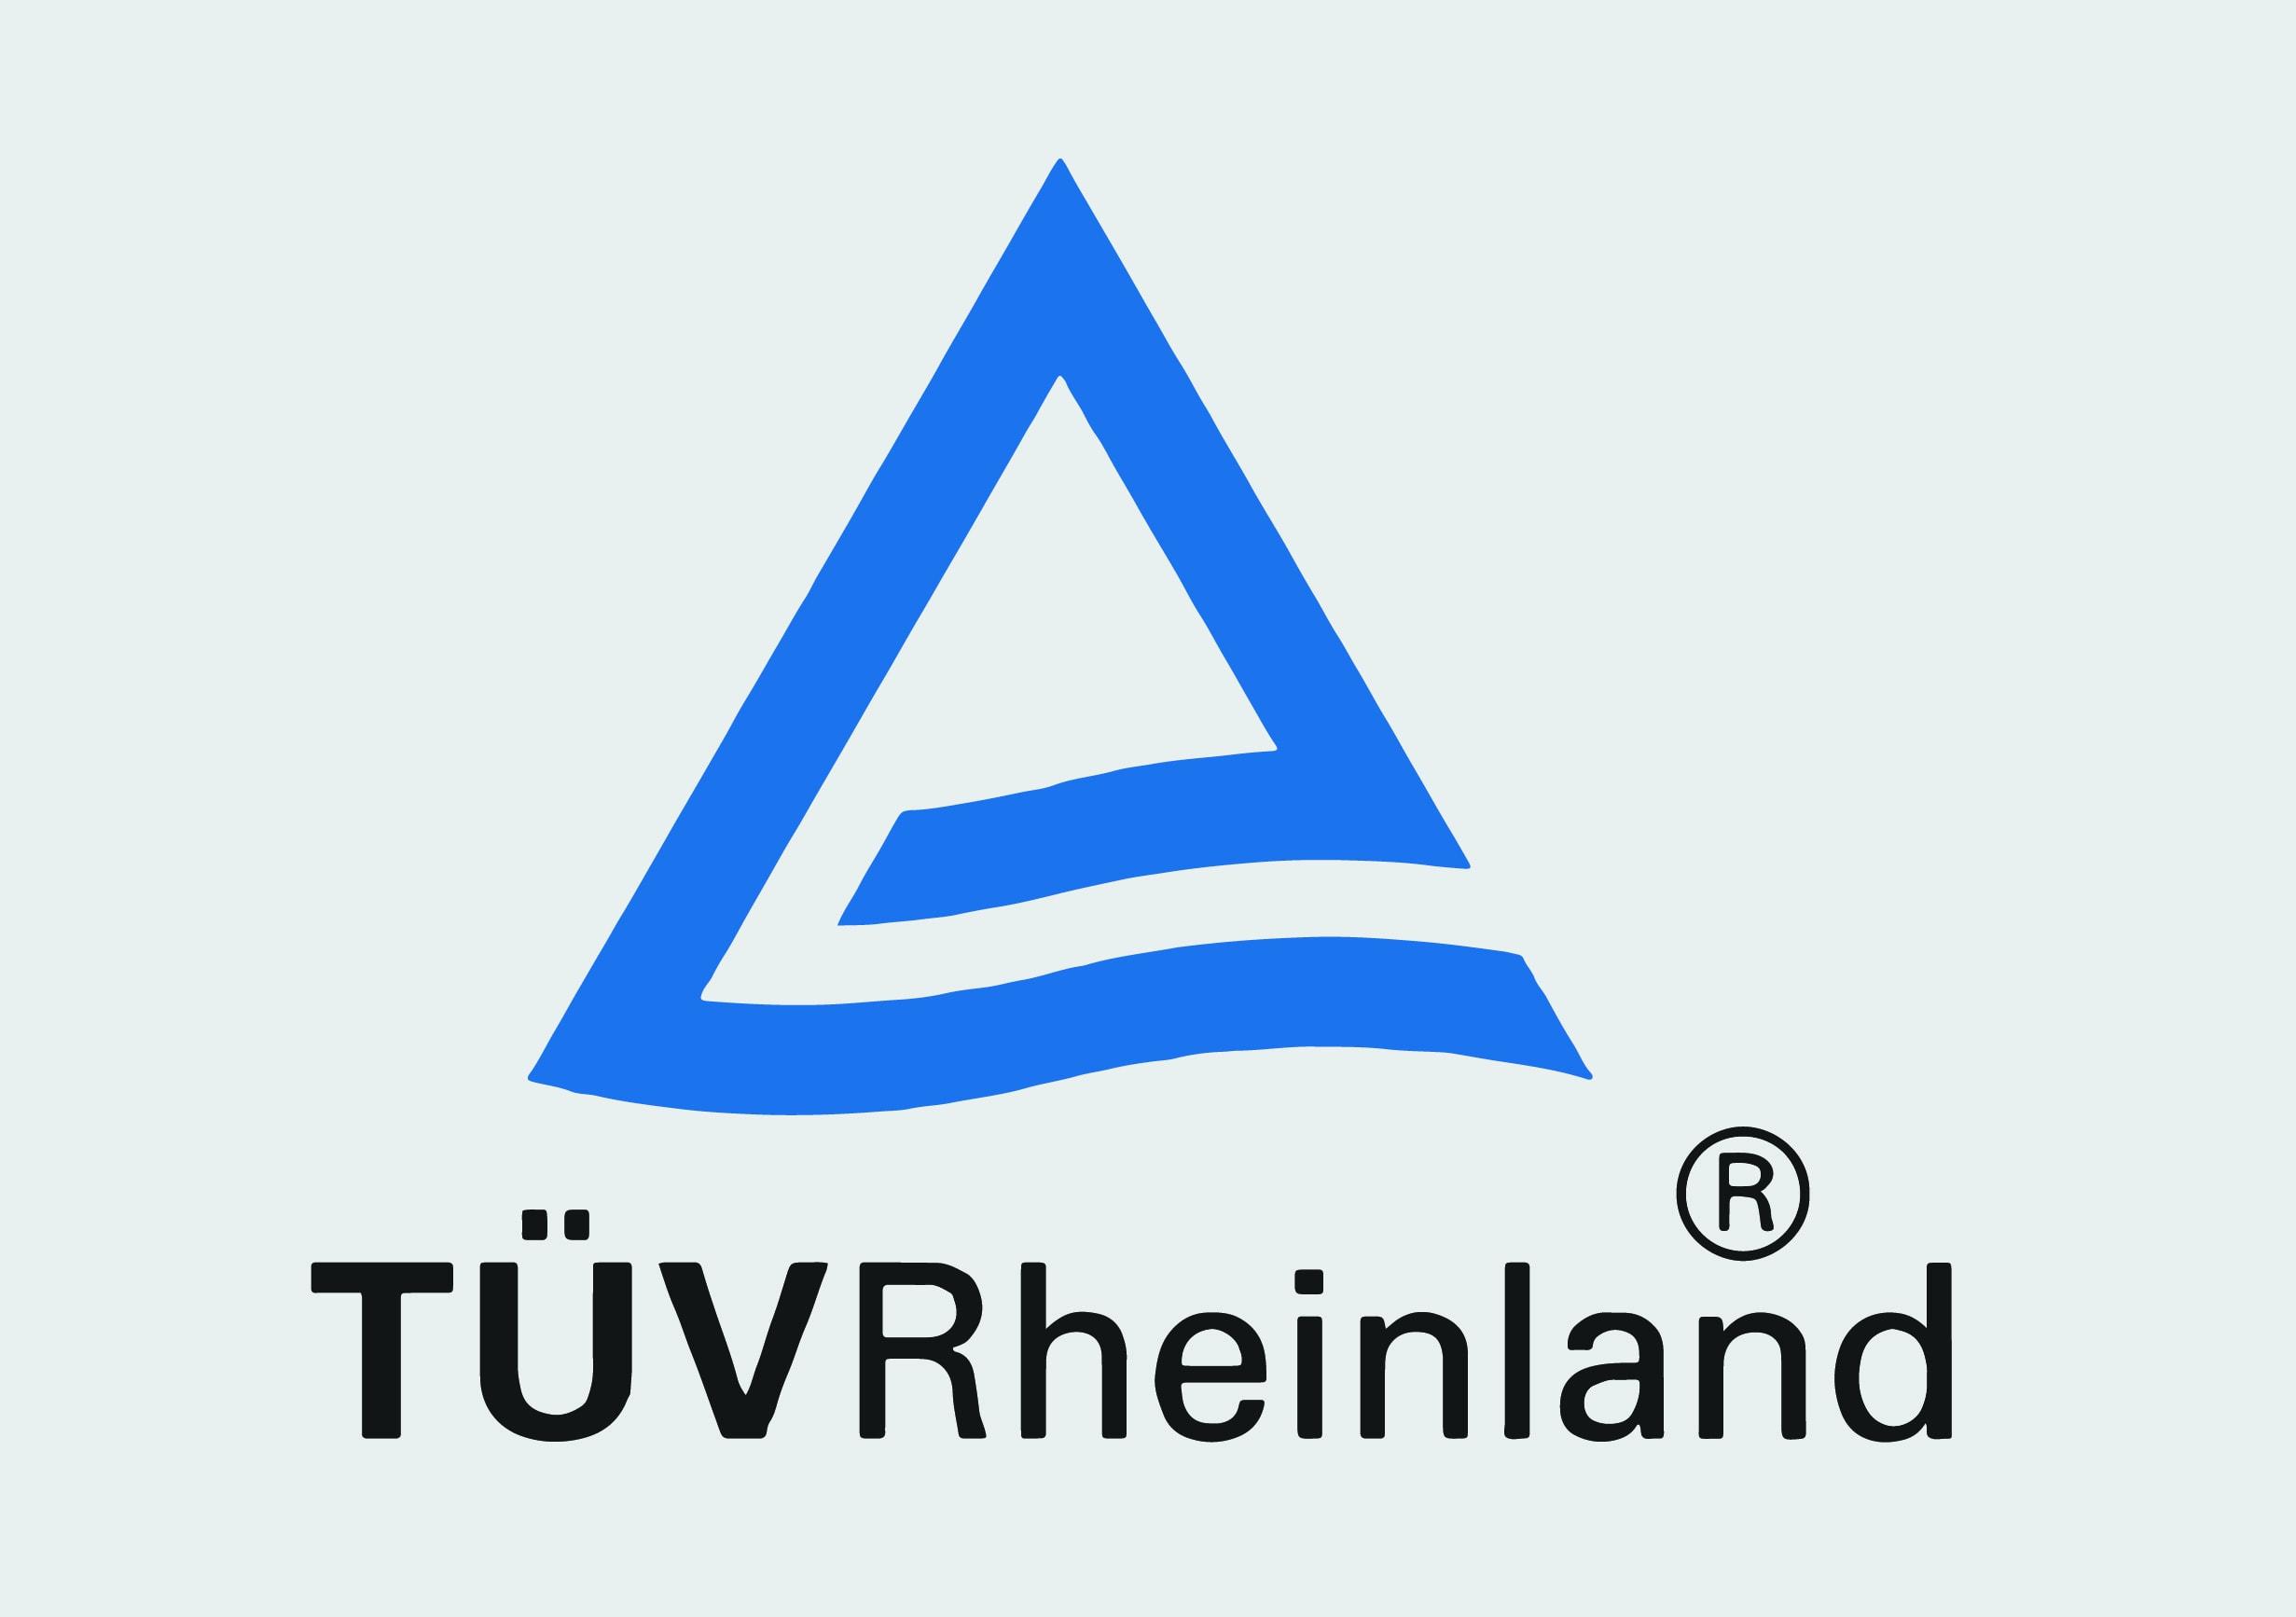 TUV Rheinland ISO 9001:2015 Certification